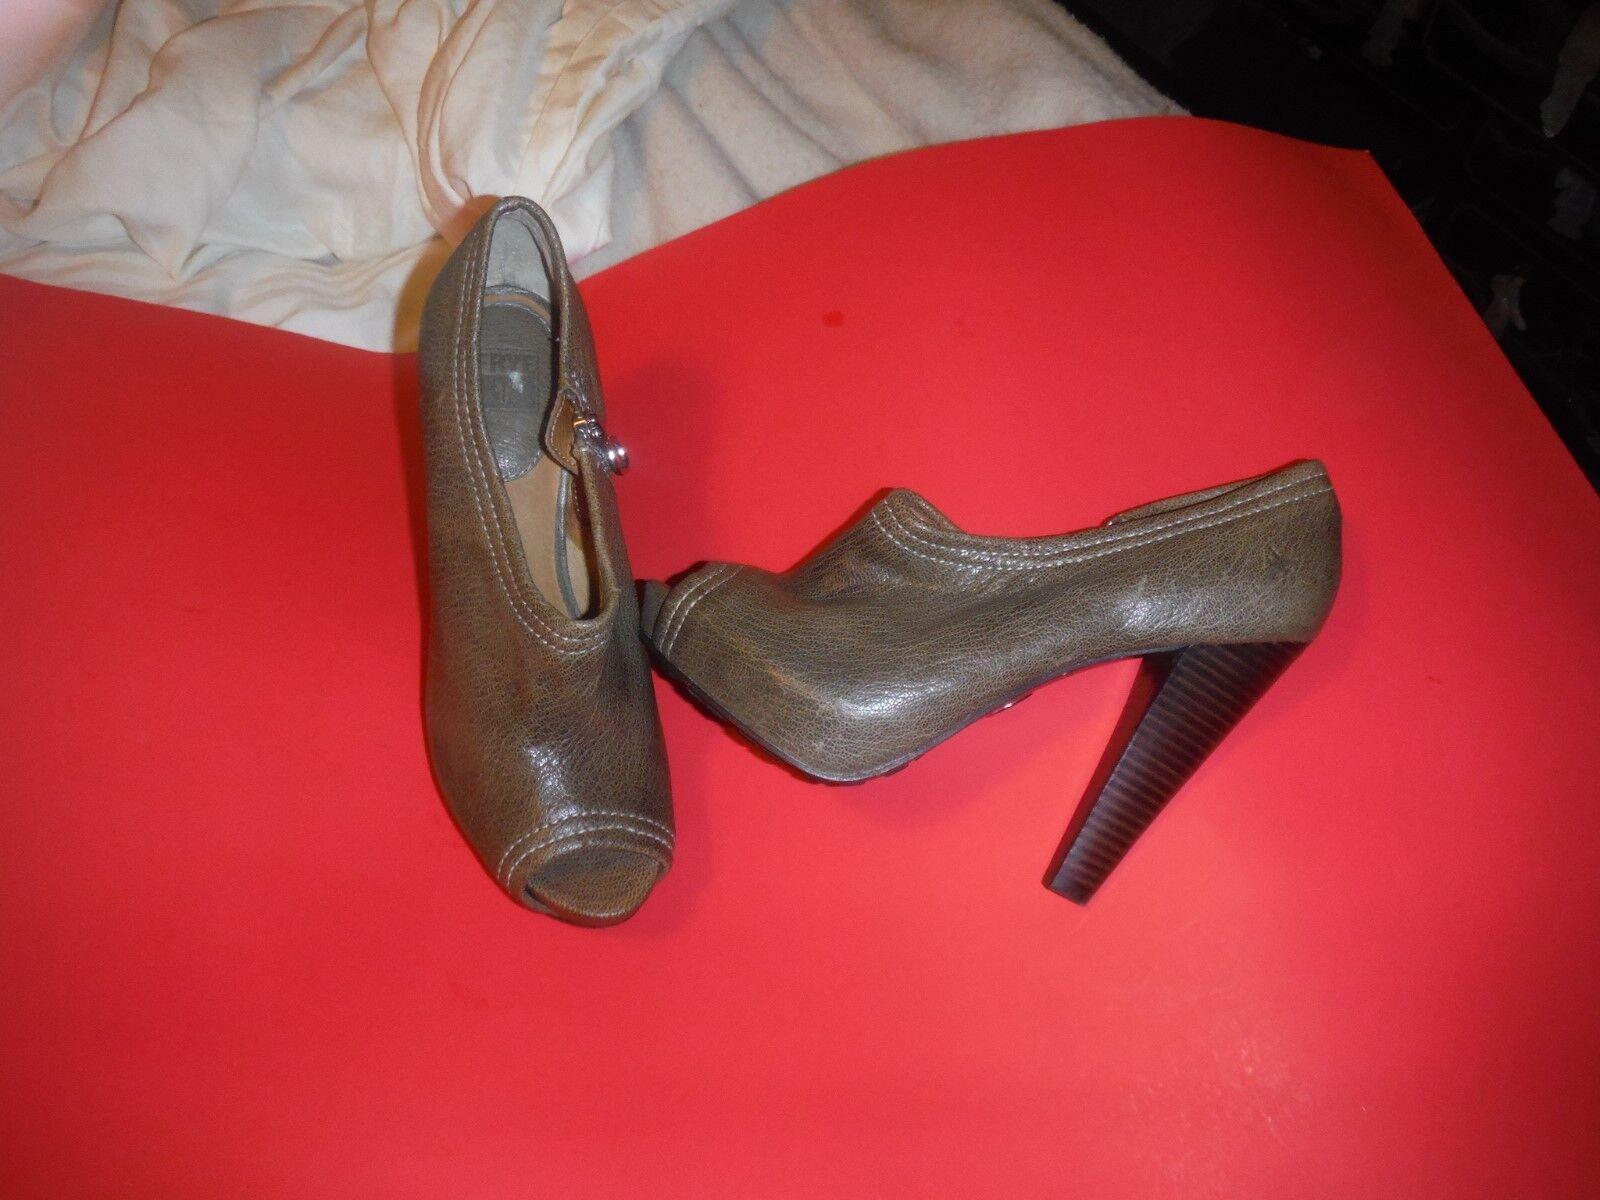 NEU FRYEGreeneddie PumpSchuhes Heels Sz 9 m open toes